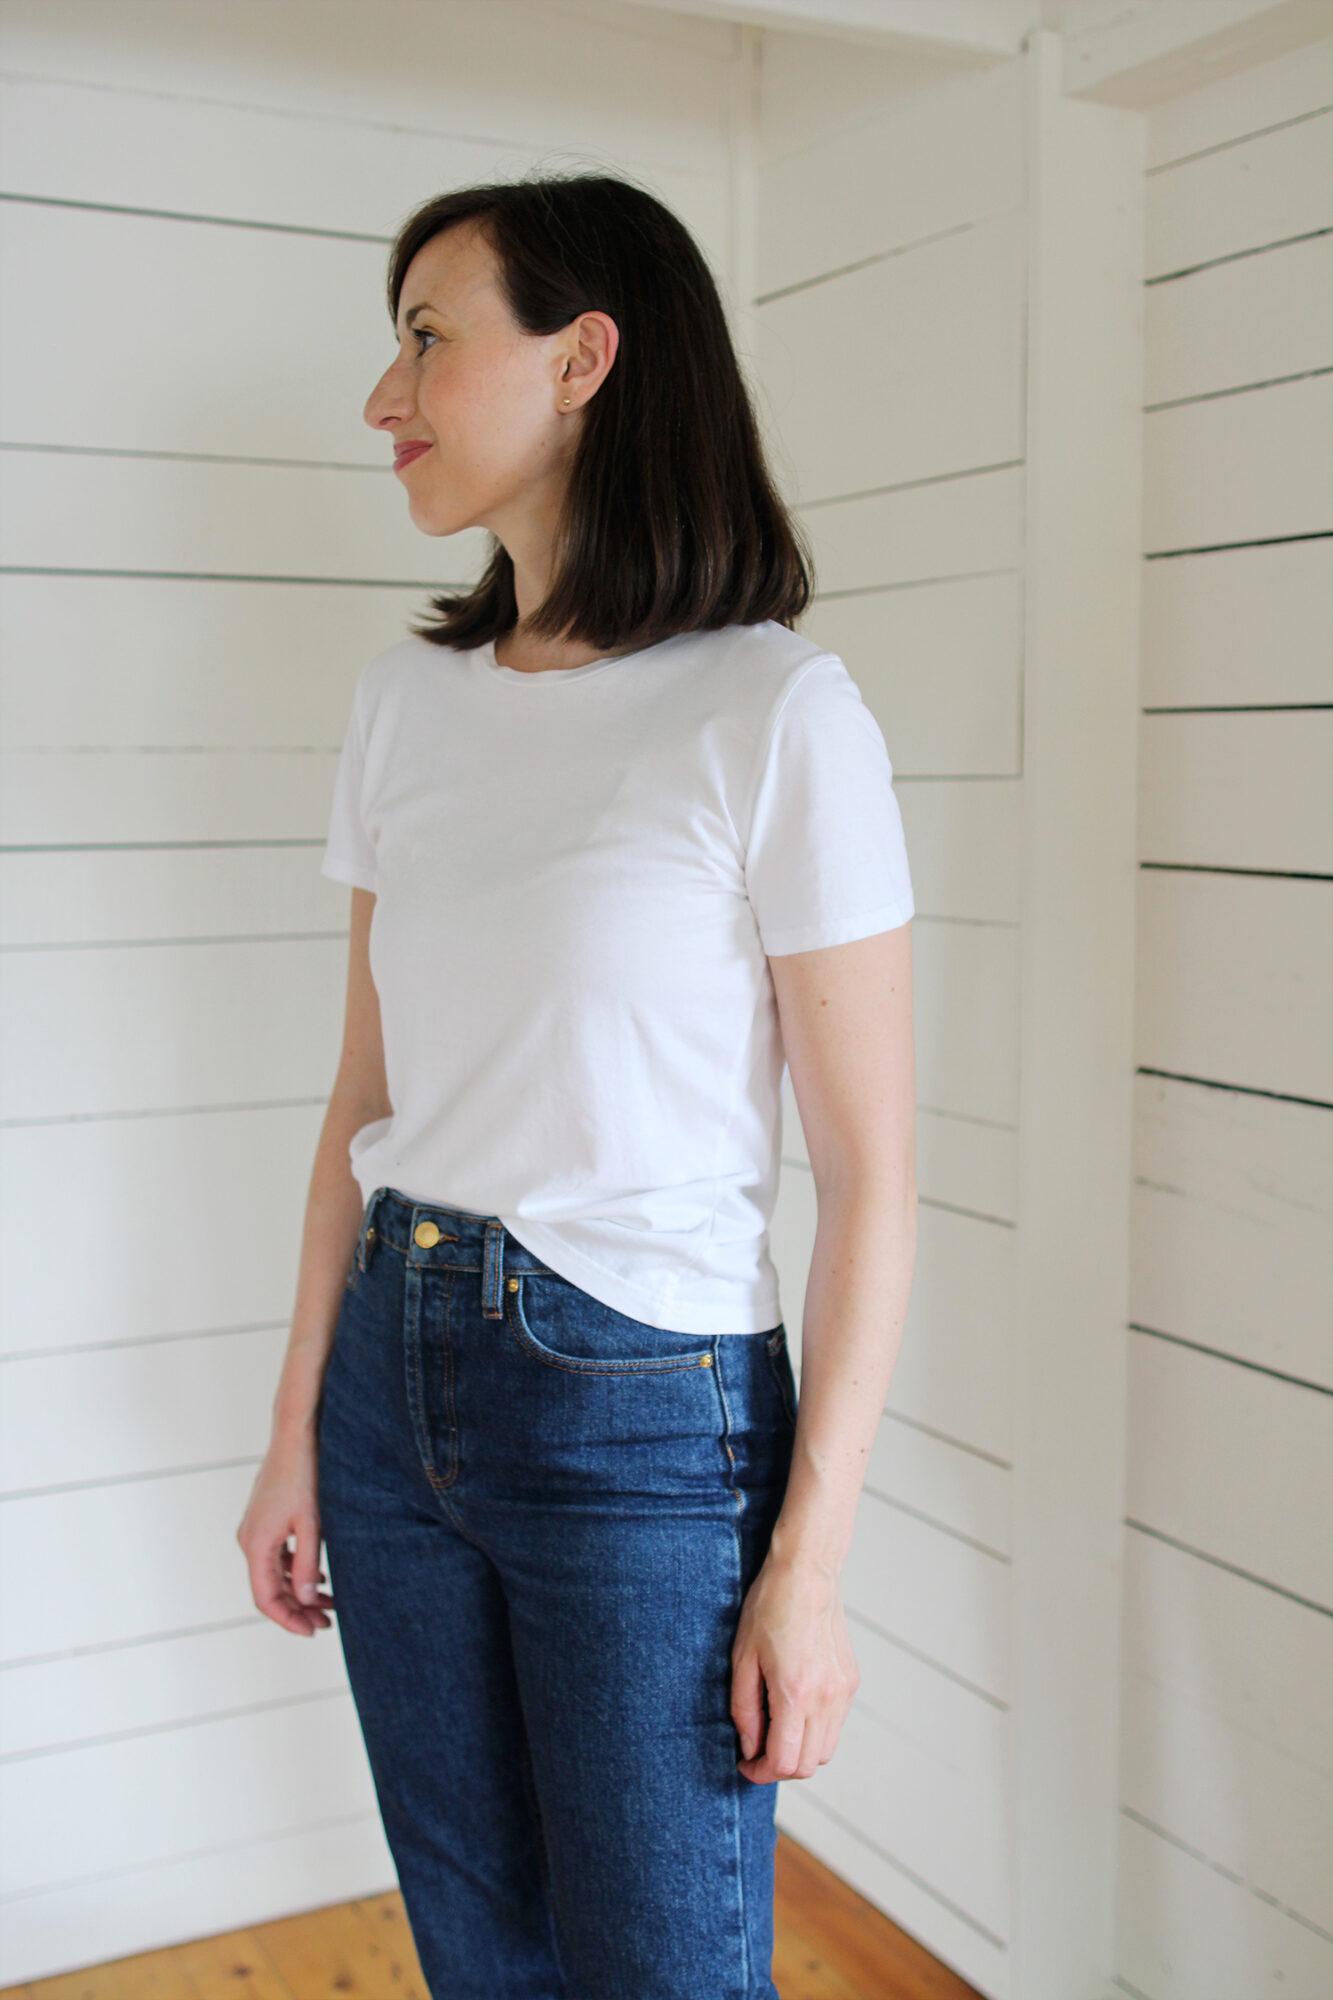 Style Bee - Spotlight on White T-Shirts